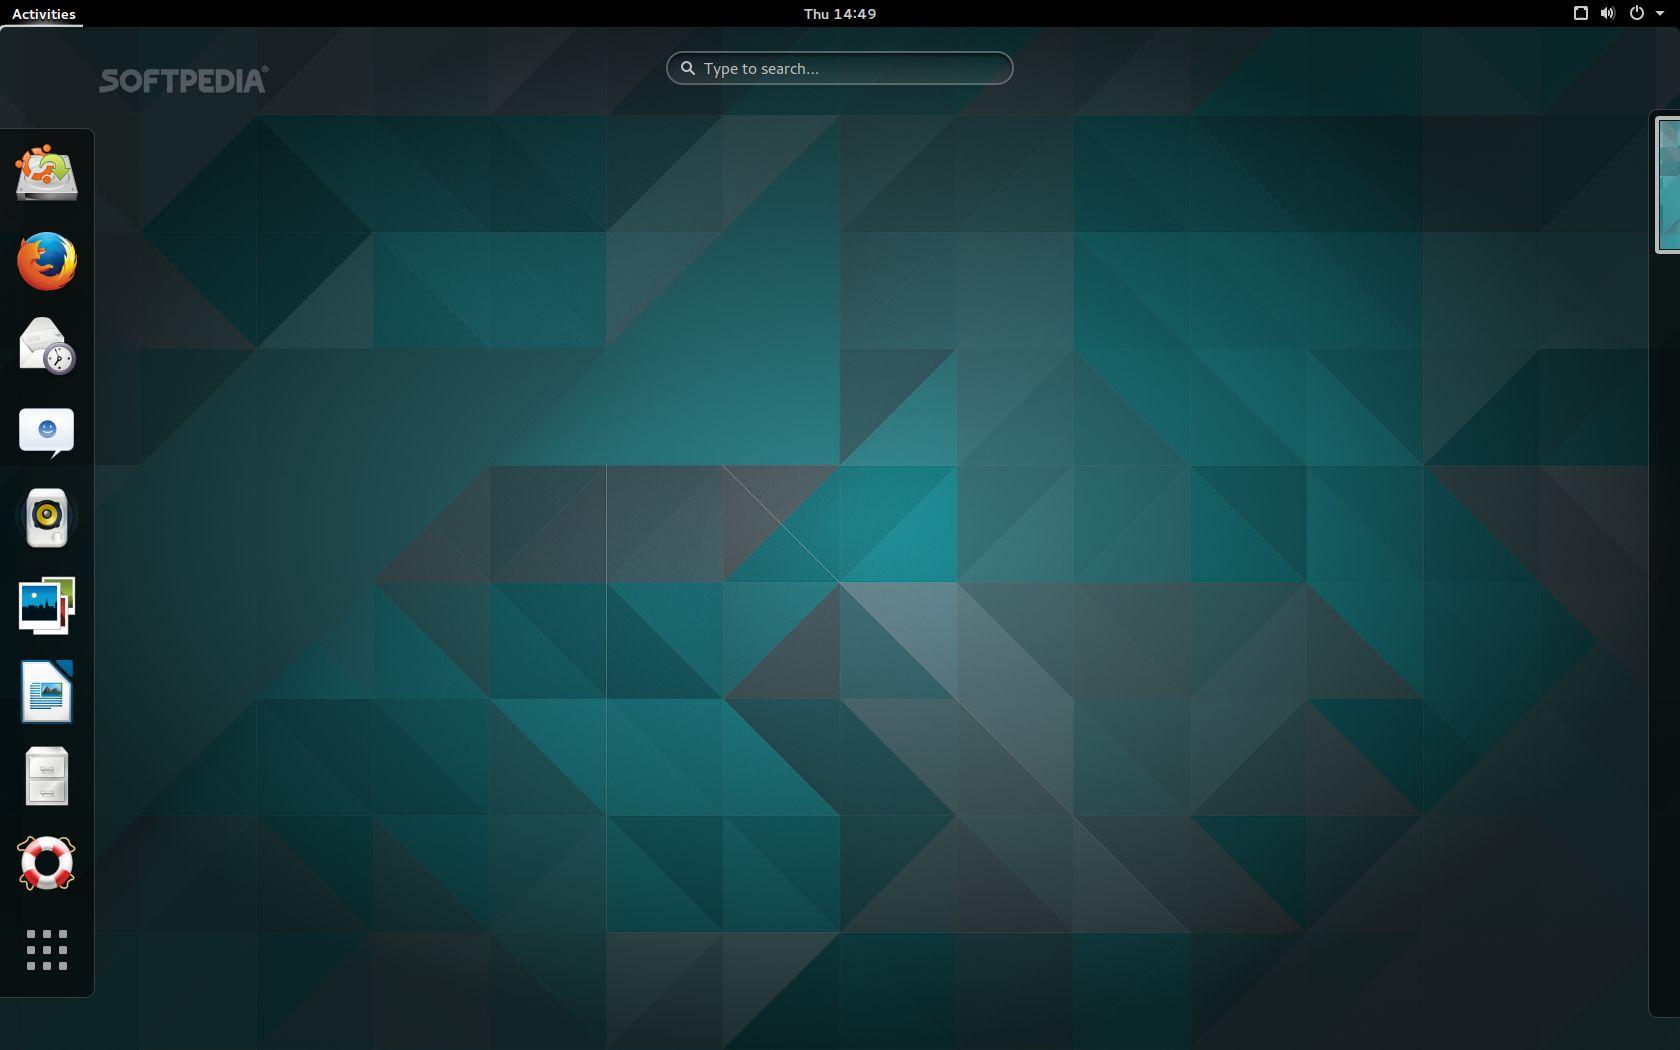 Ubuntu gnome 15.04